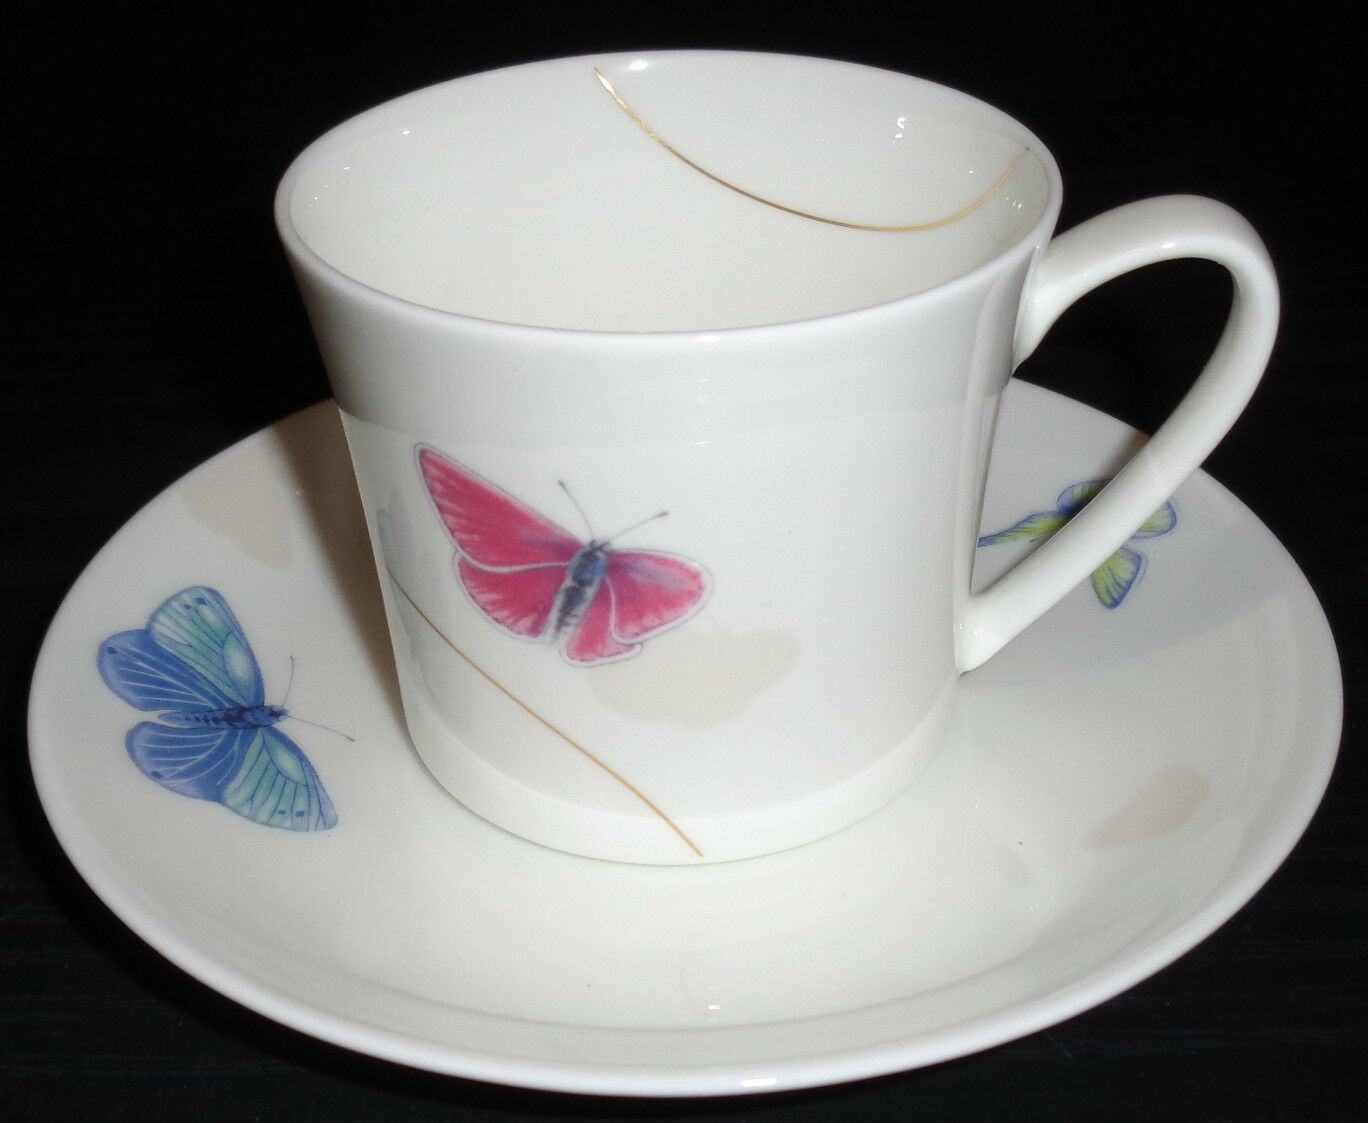 Rosanthal Curve Pepela  6 6 6 Kaffeetassen & Untertassen 12 tlg Neuware 1.Wahl a37dae